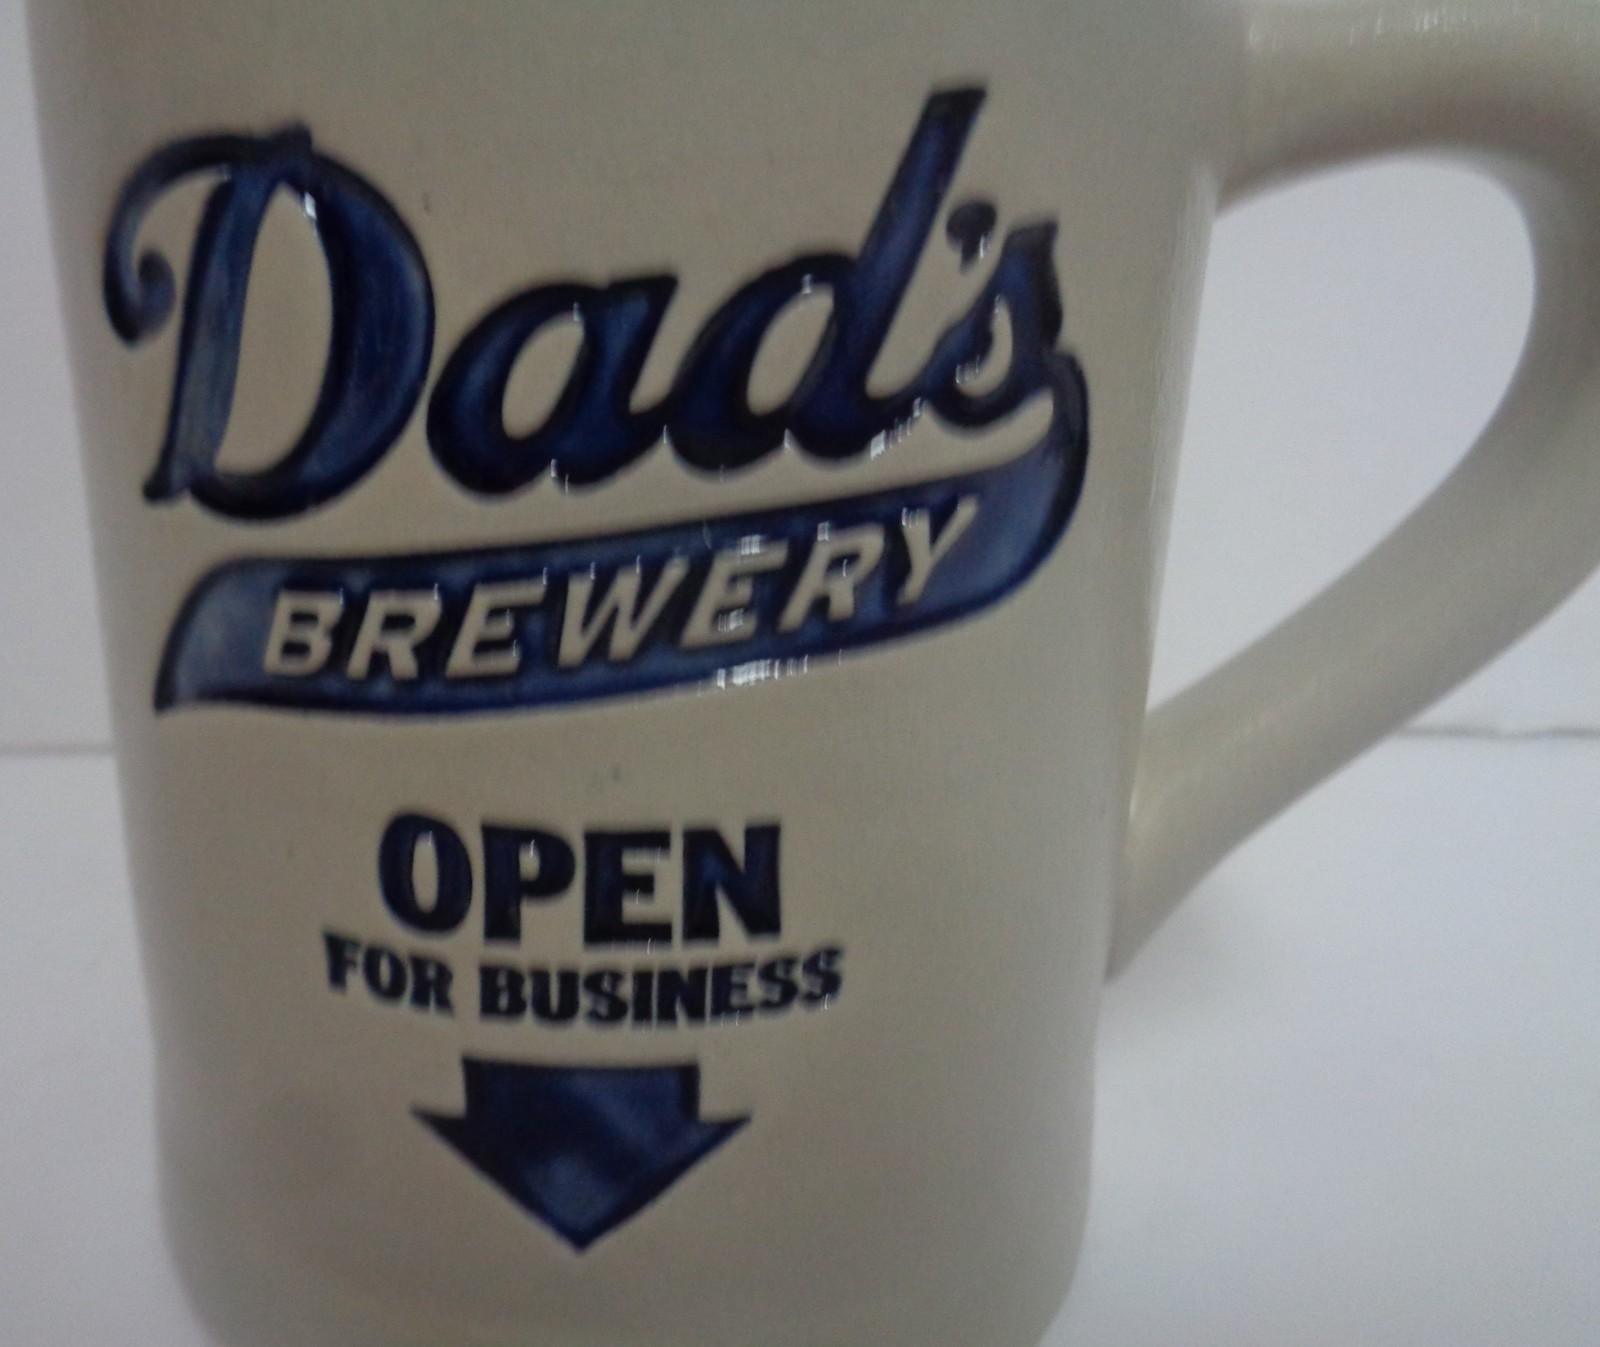 Hallmark Dad's Brewery Open For Business Mug Built In Bottle Opener 16 oz